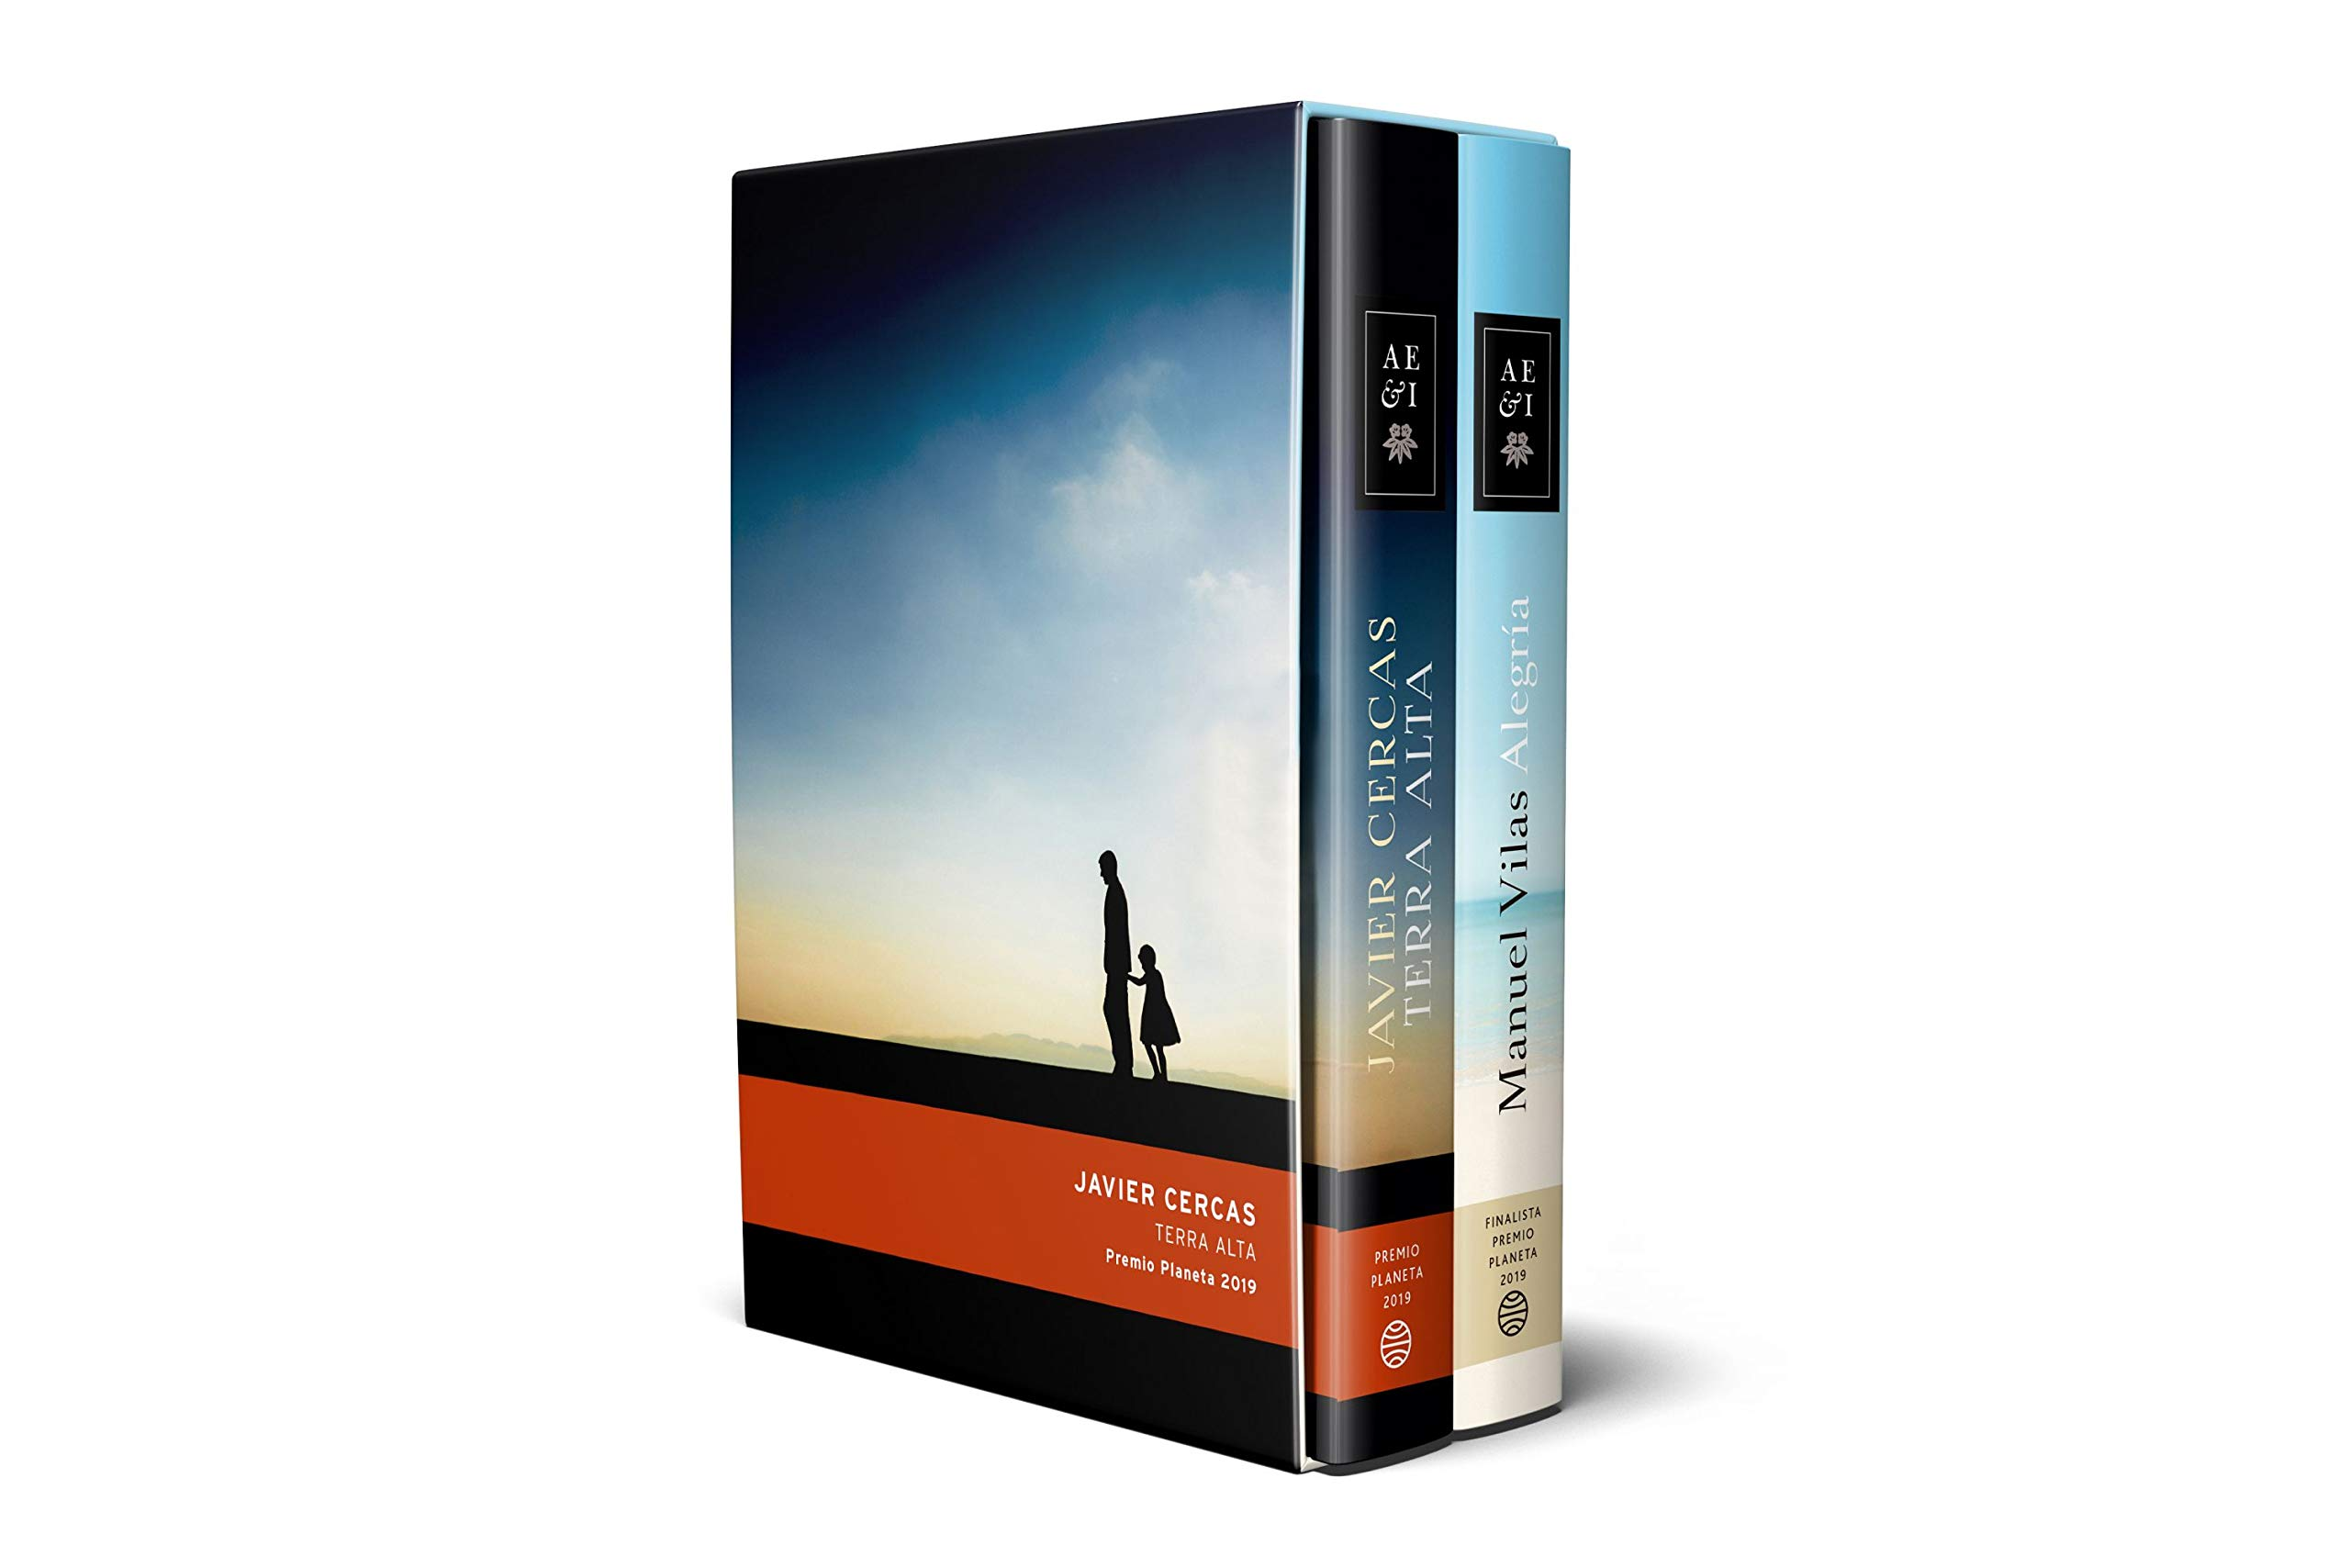 Estuche Premio Planeta 2019: Amazon.es: Javier Cercas, Manuel ...